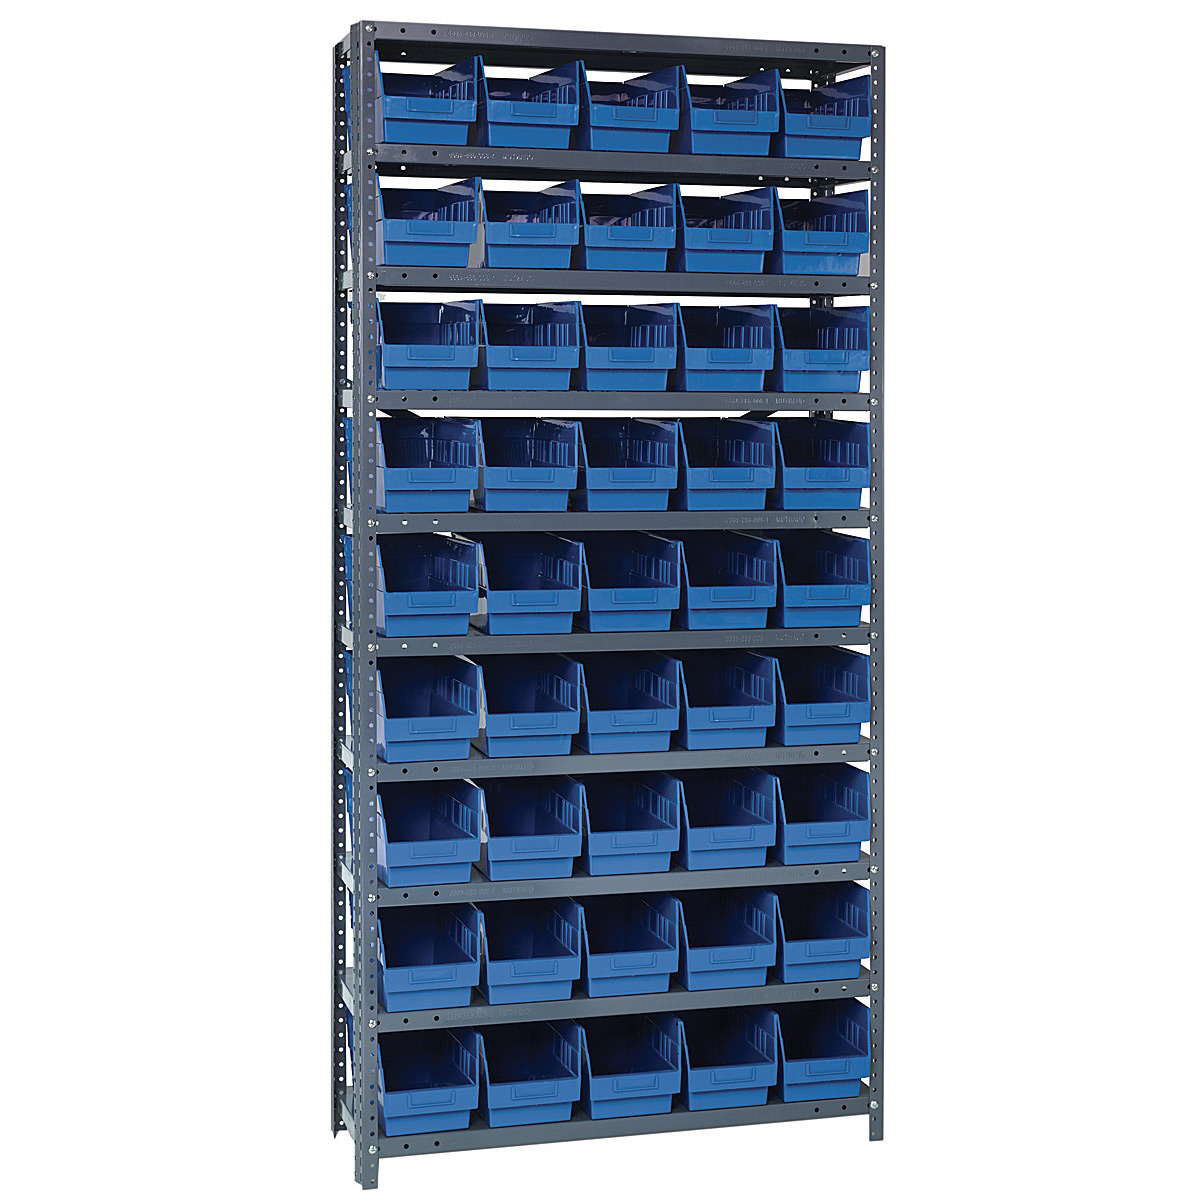 Bin Shelving System In Plastic Storage Bins